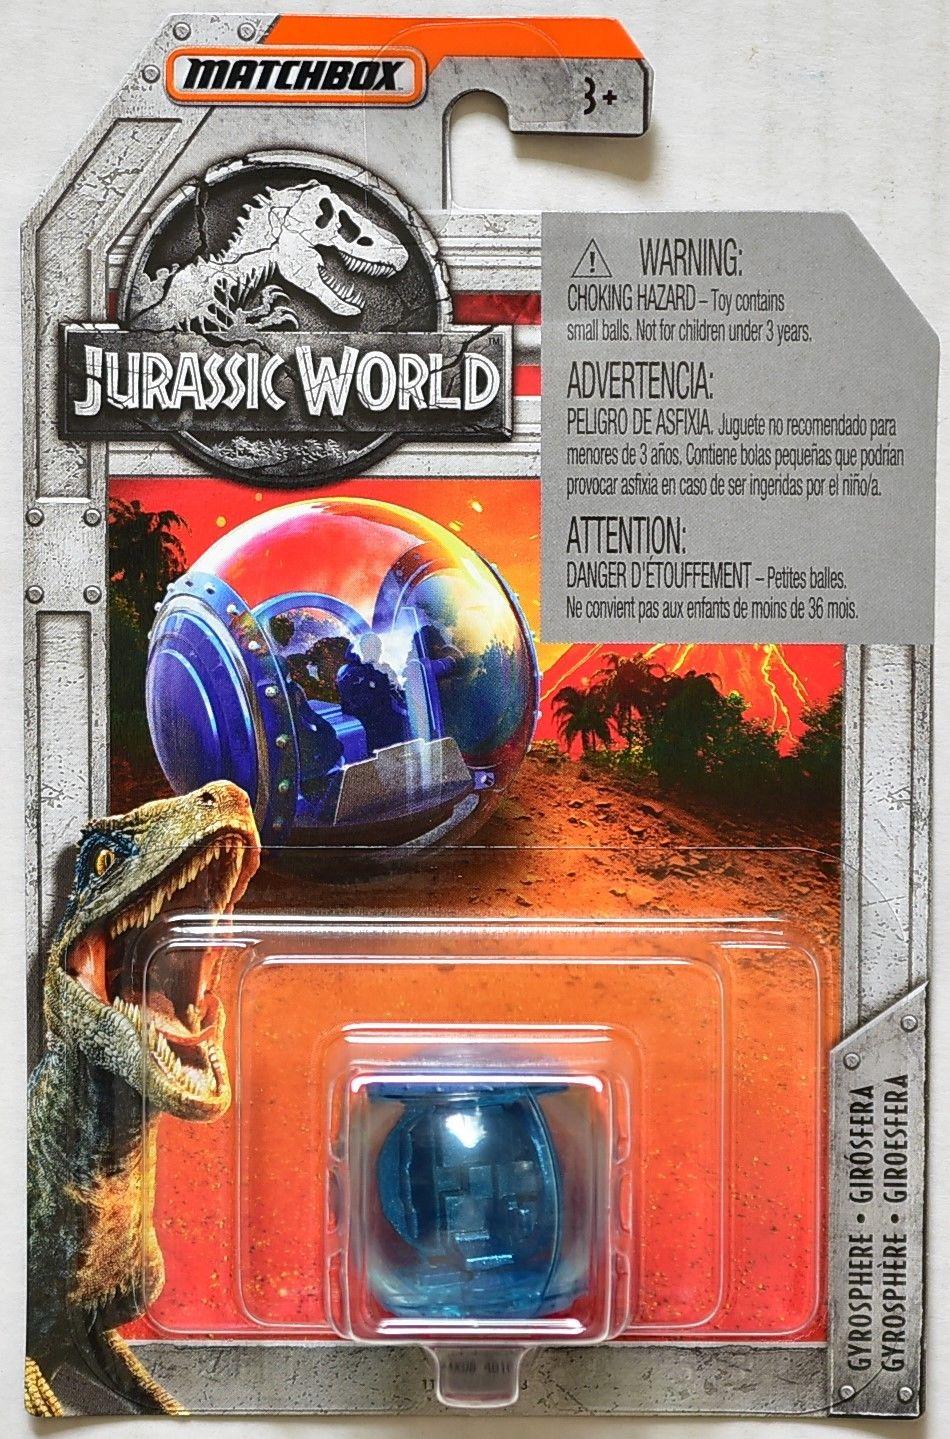 Jurassic World 2018 Series Matchbox Cars Wiki Fandom Powered By Wikia